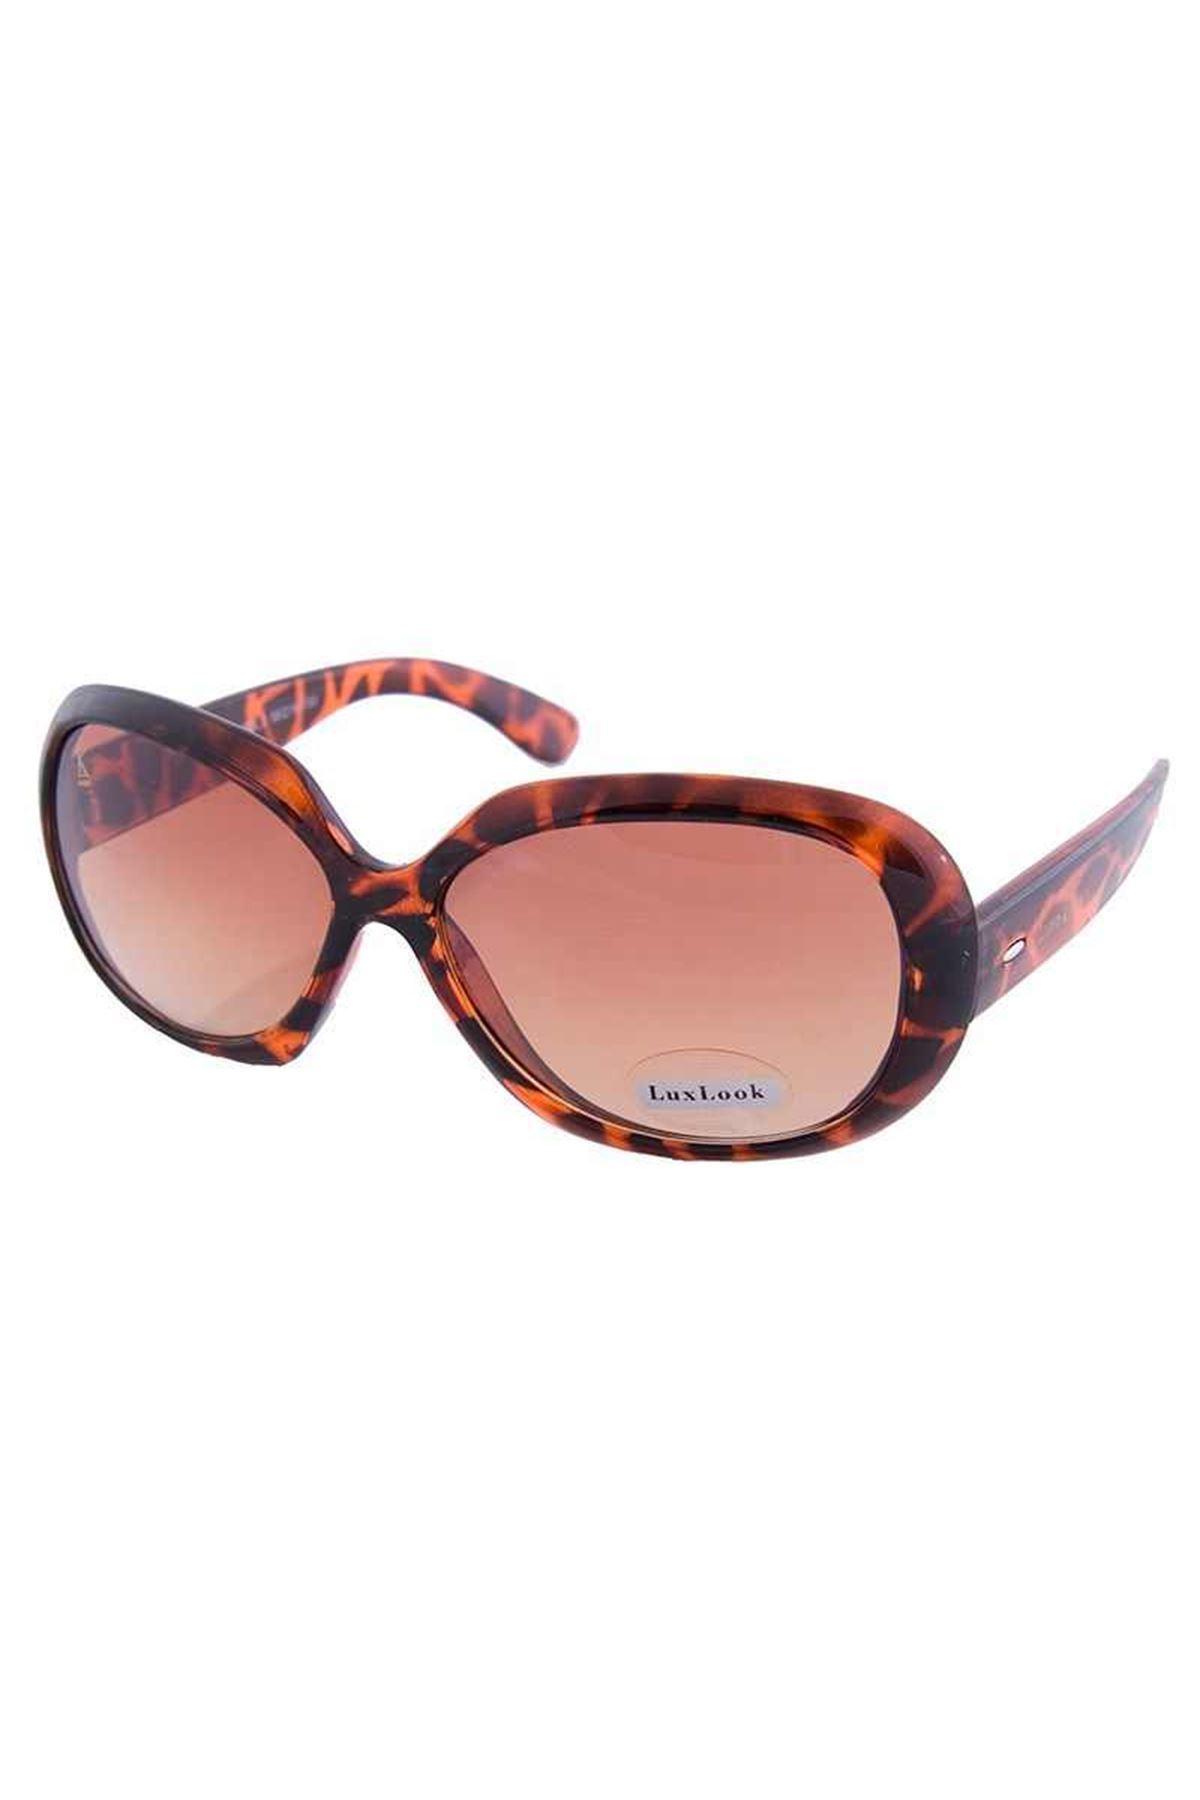 Lloyd Klein Güneş Gözlüğü 33A-72760